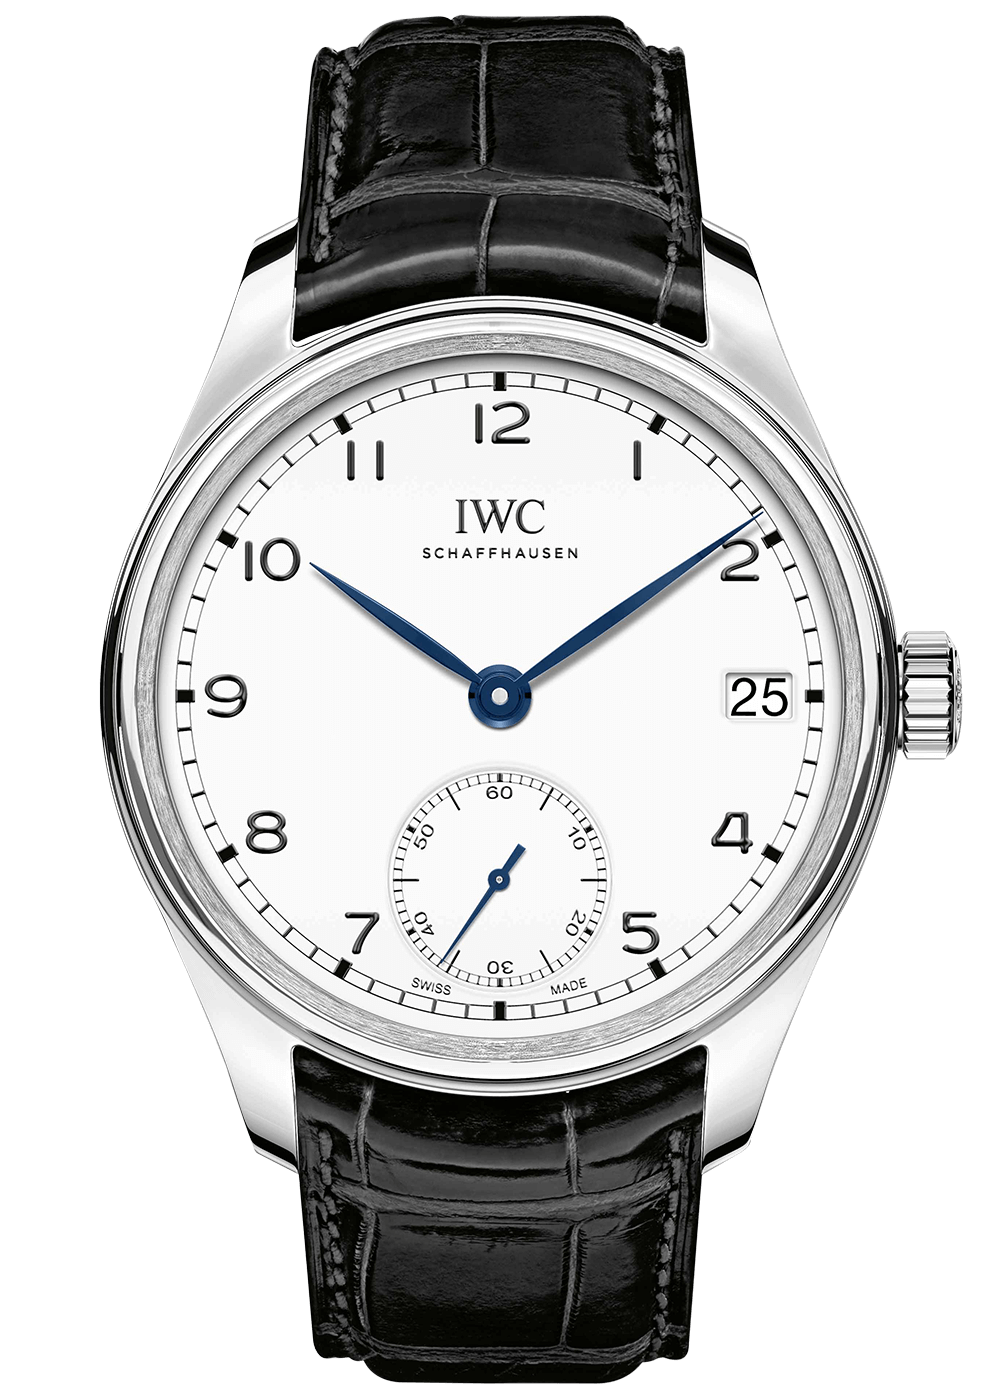 IWC Jubiläumskollektion